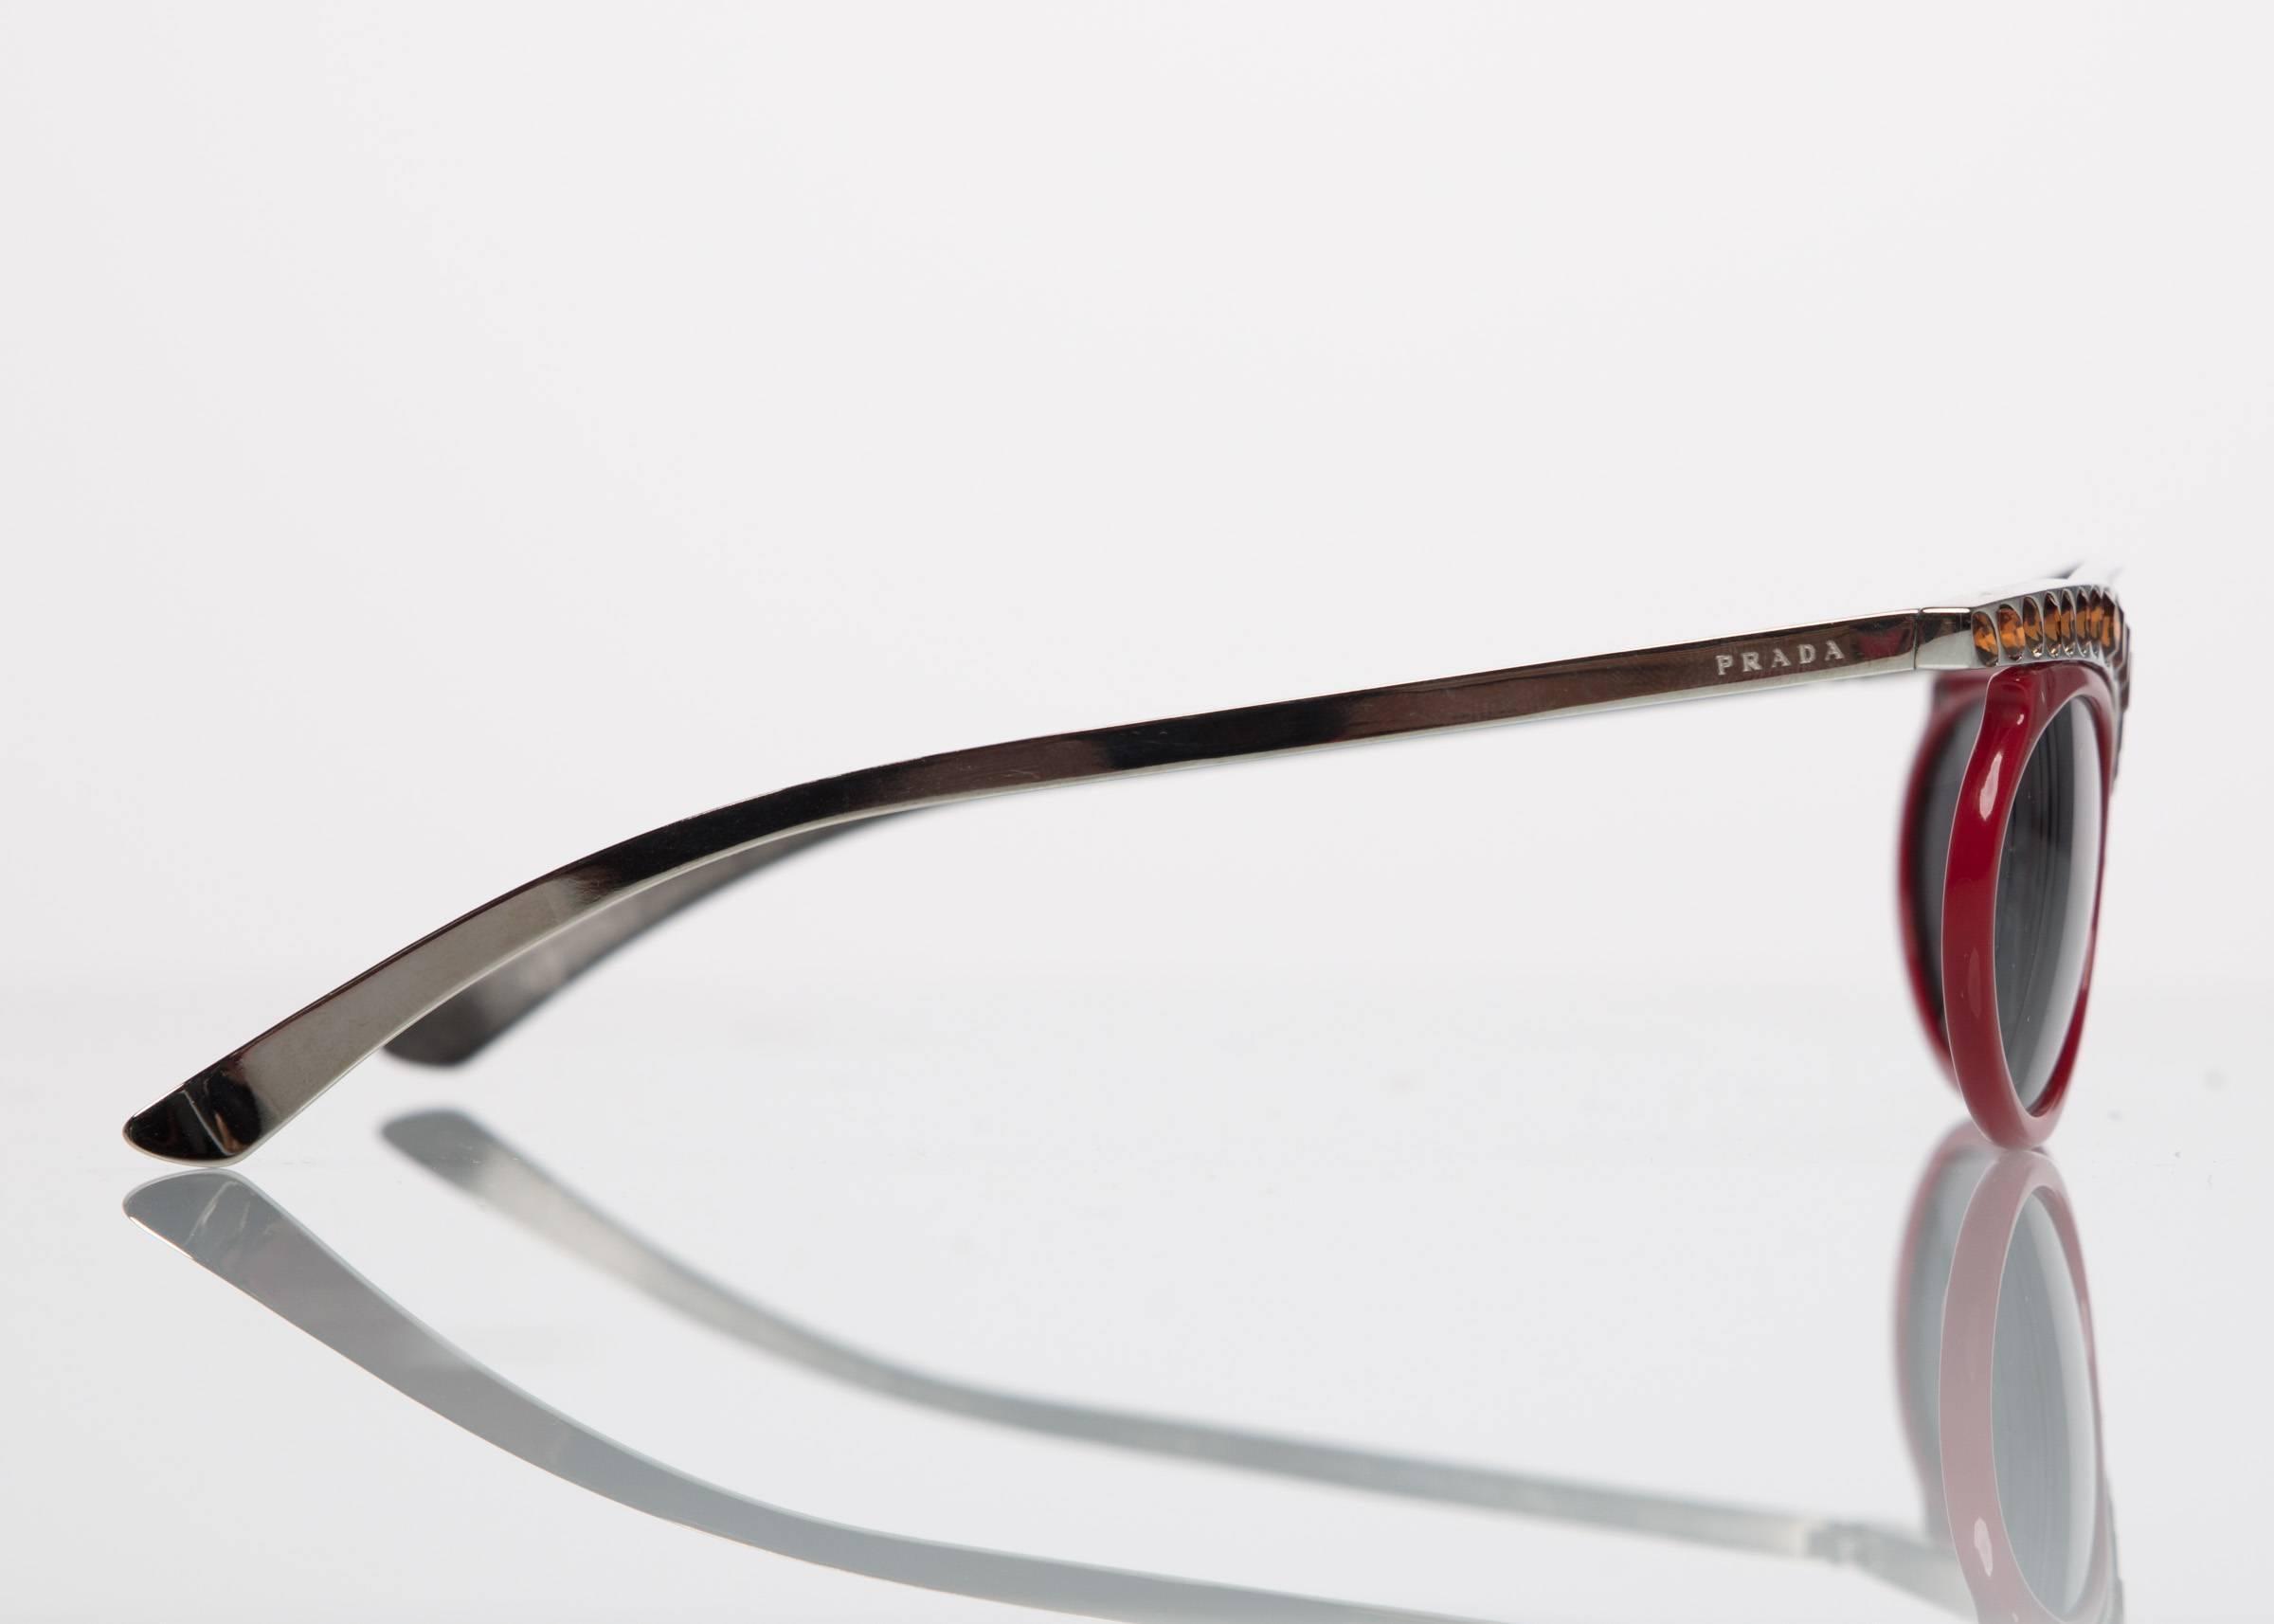 fc1d2561fd87 ... shop womens 2012 prada runway red cat eye amber crystal sunglasses for  sale ce65a 1fd21